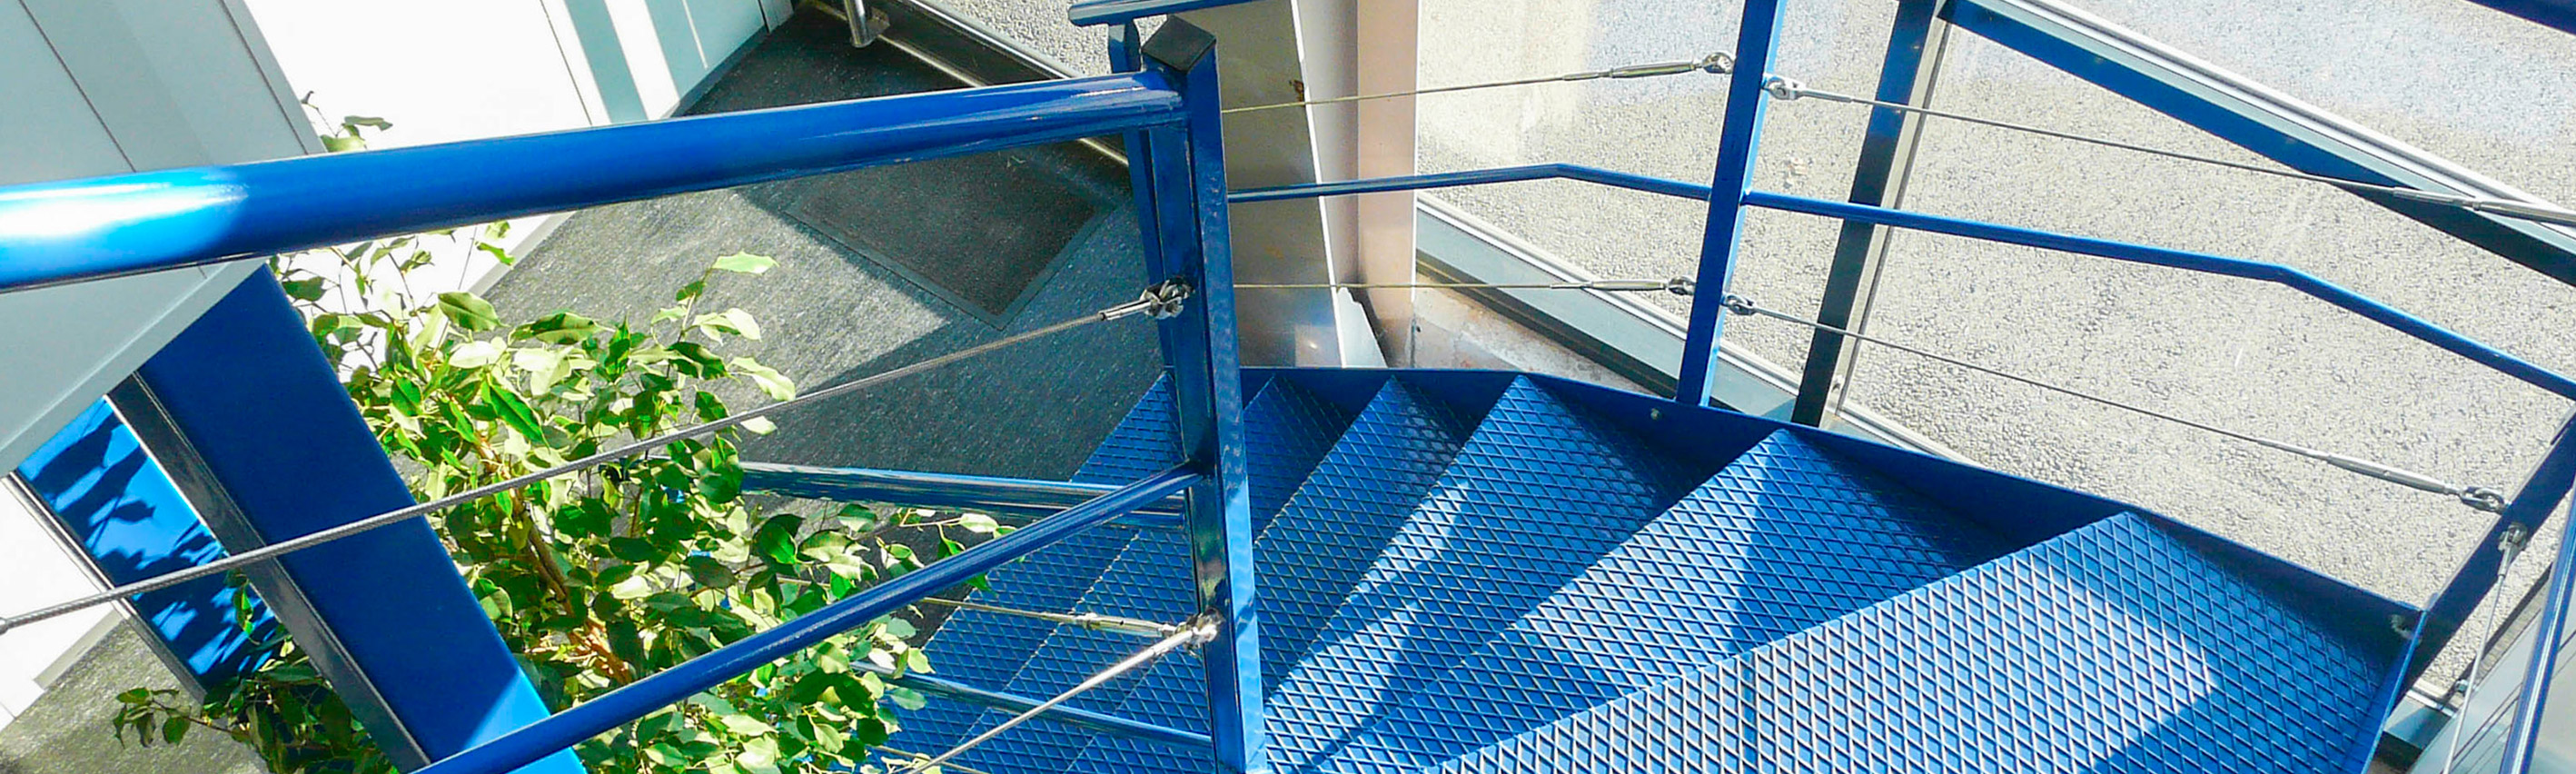 renovation-extension-batiments-industriels-agora-architecte-contractant-general